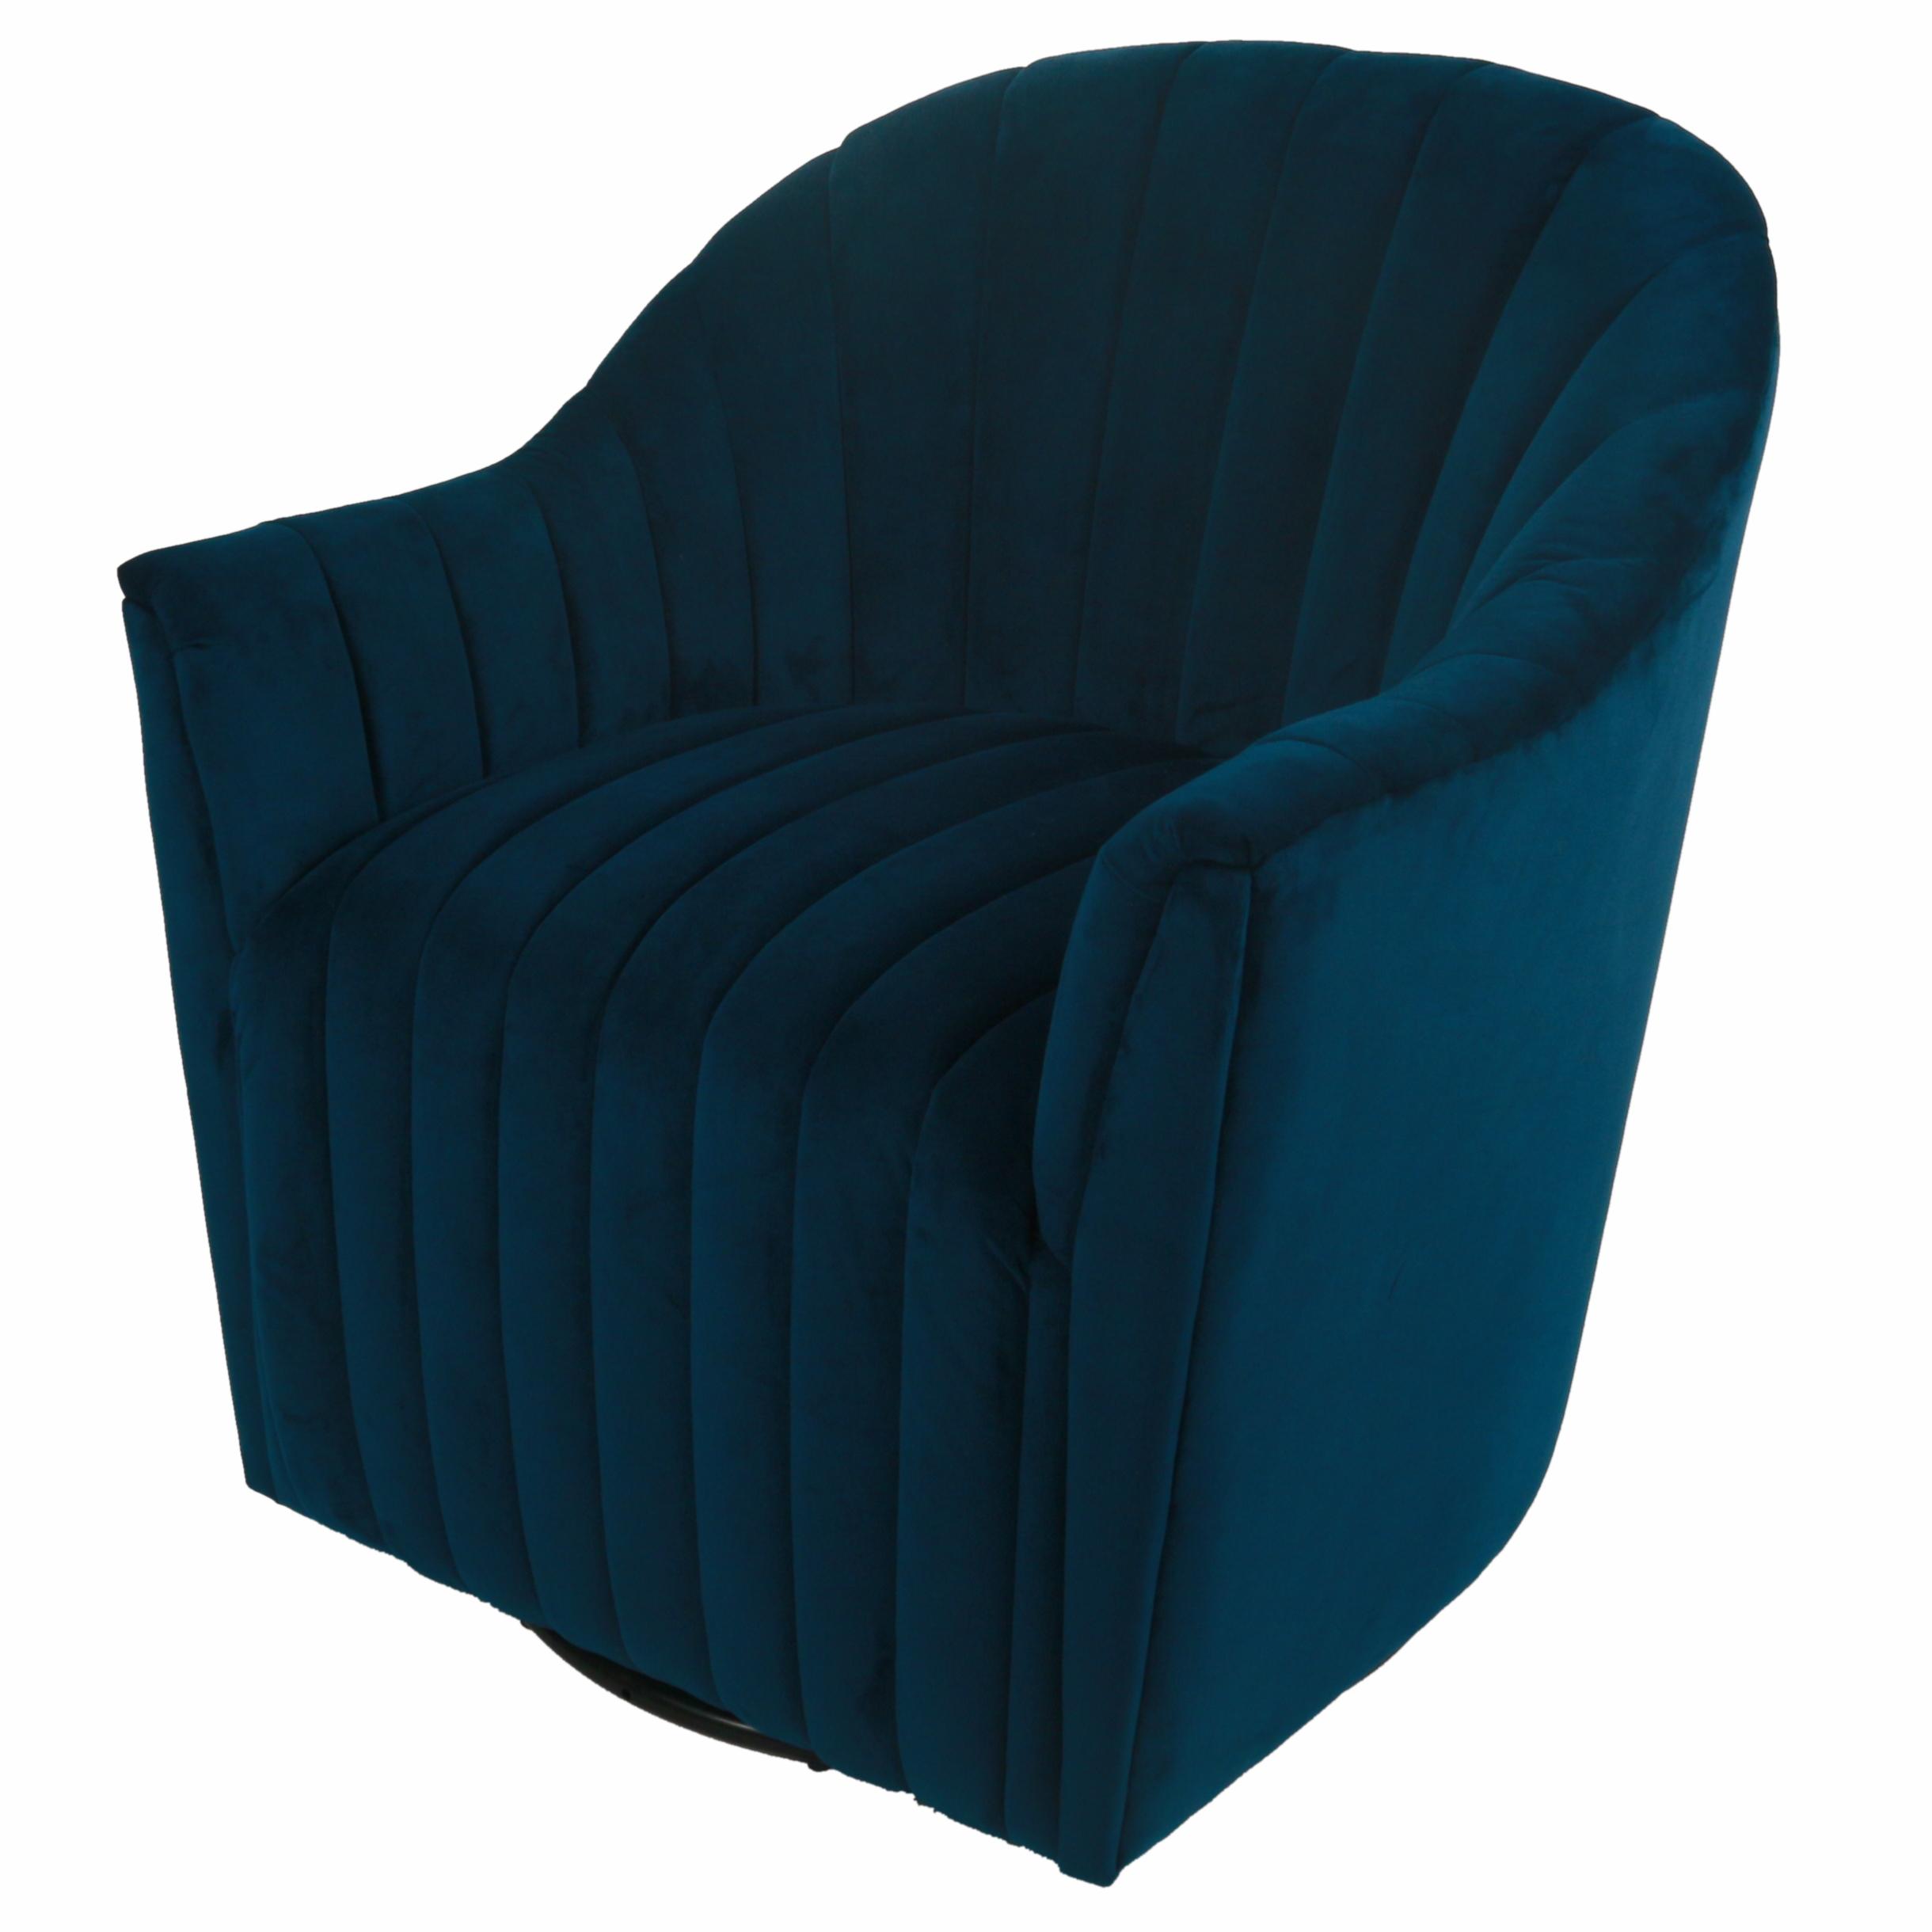 3500033 Npd Home Furniture Wholesale Lifestyle Furnishings